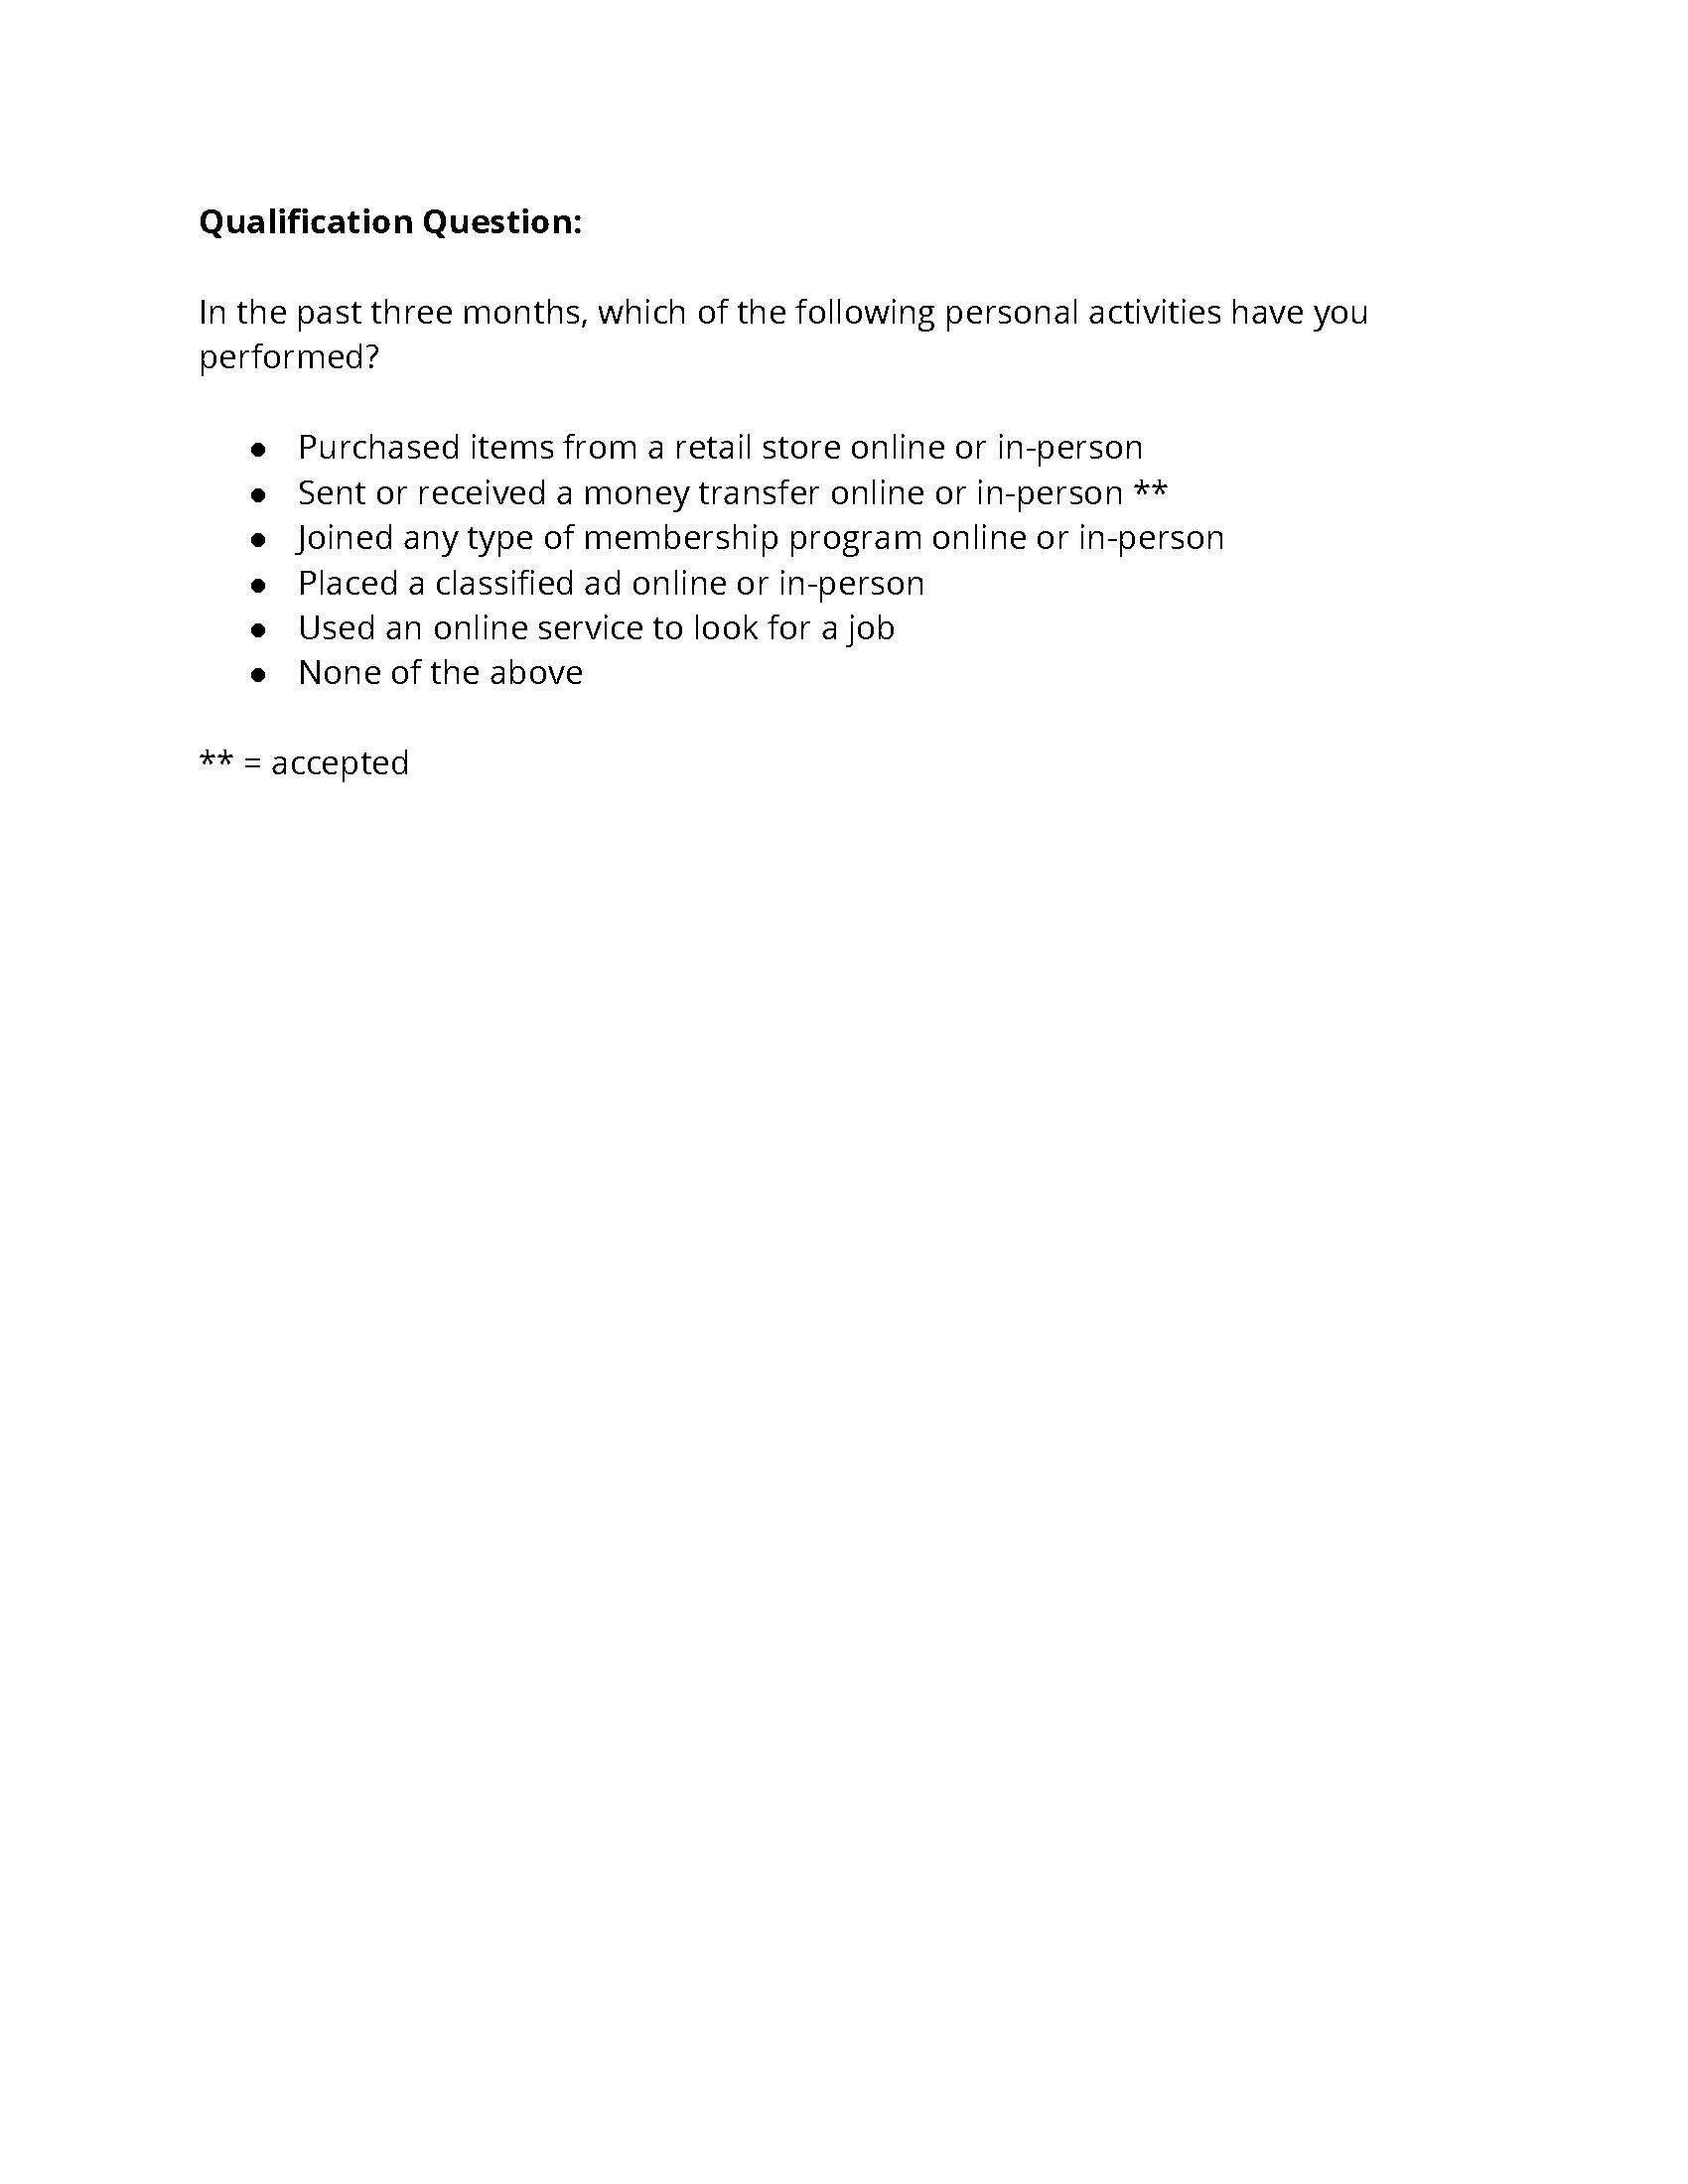 MyWU-UserTestplan Edited_Page_2.png